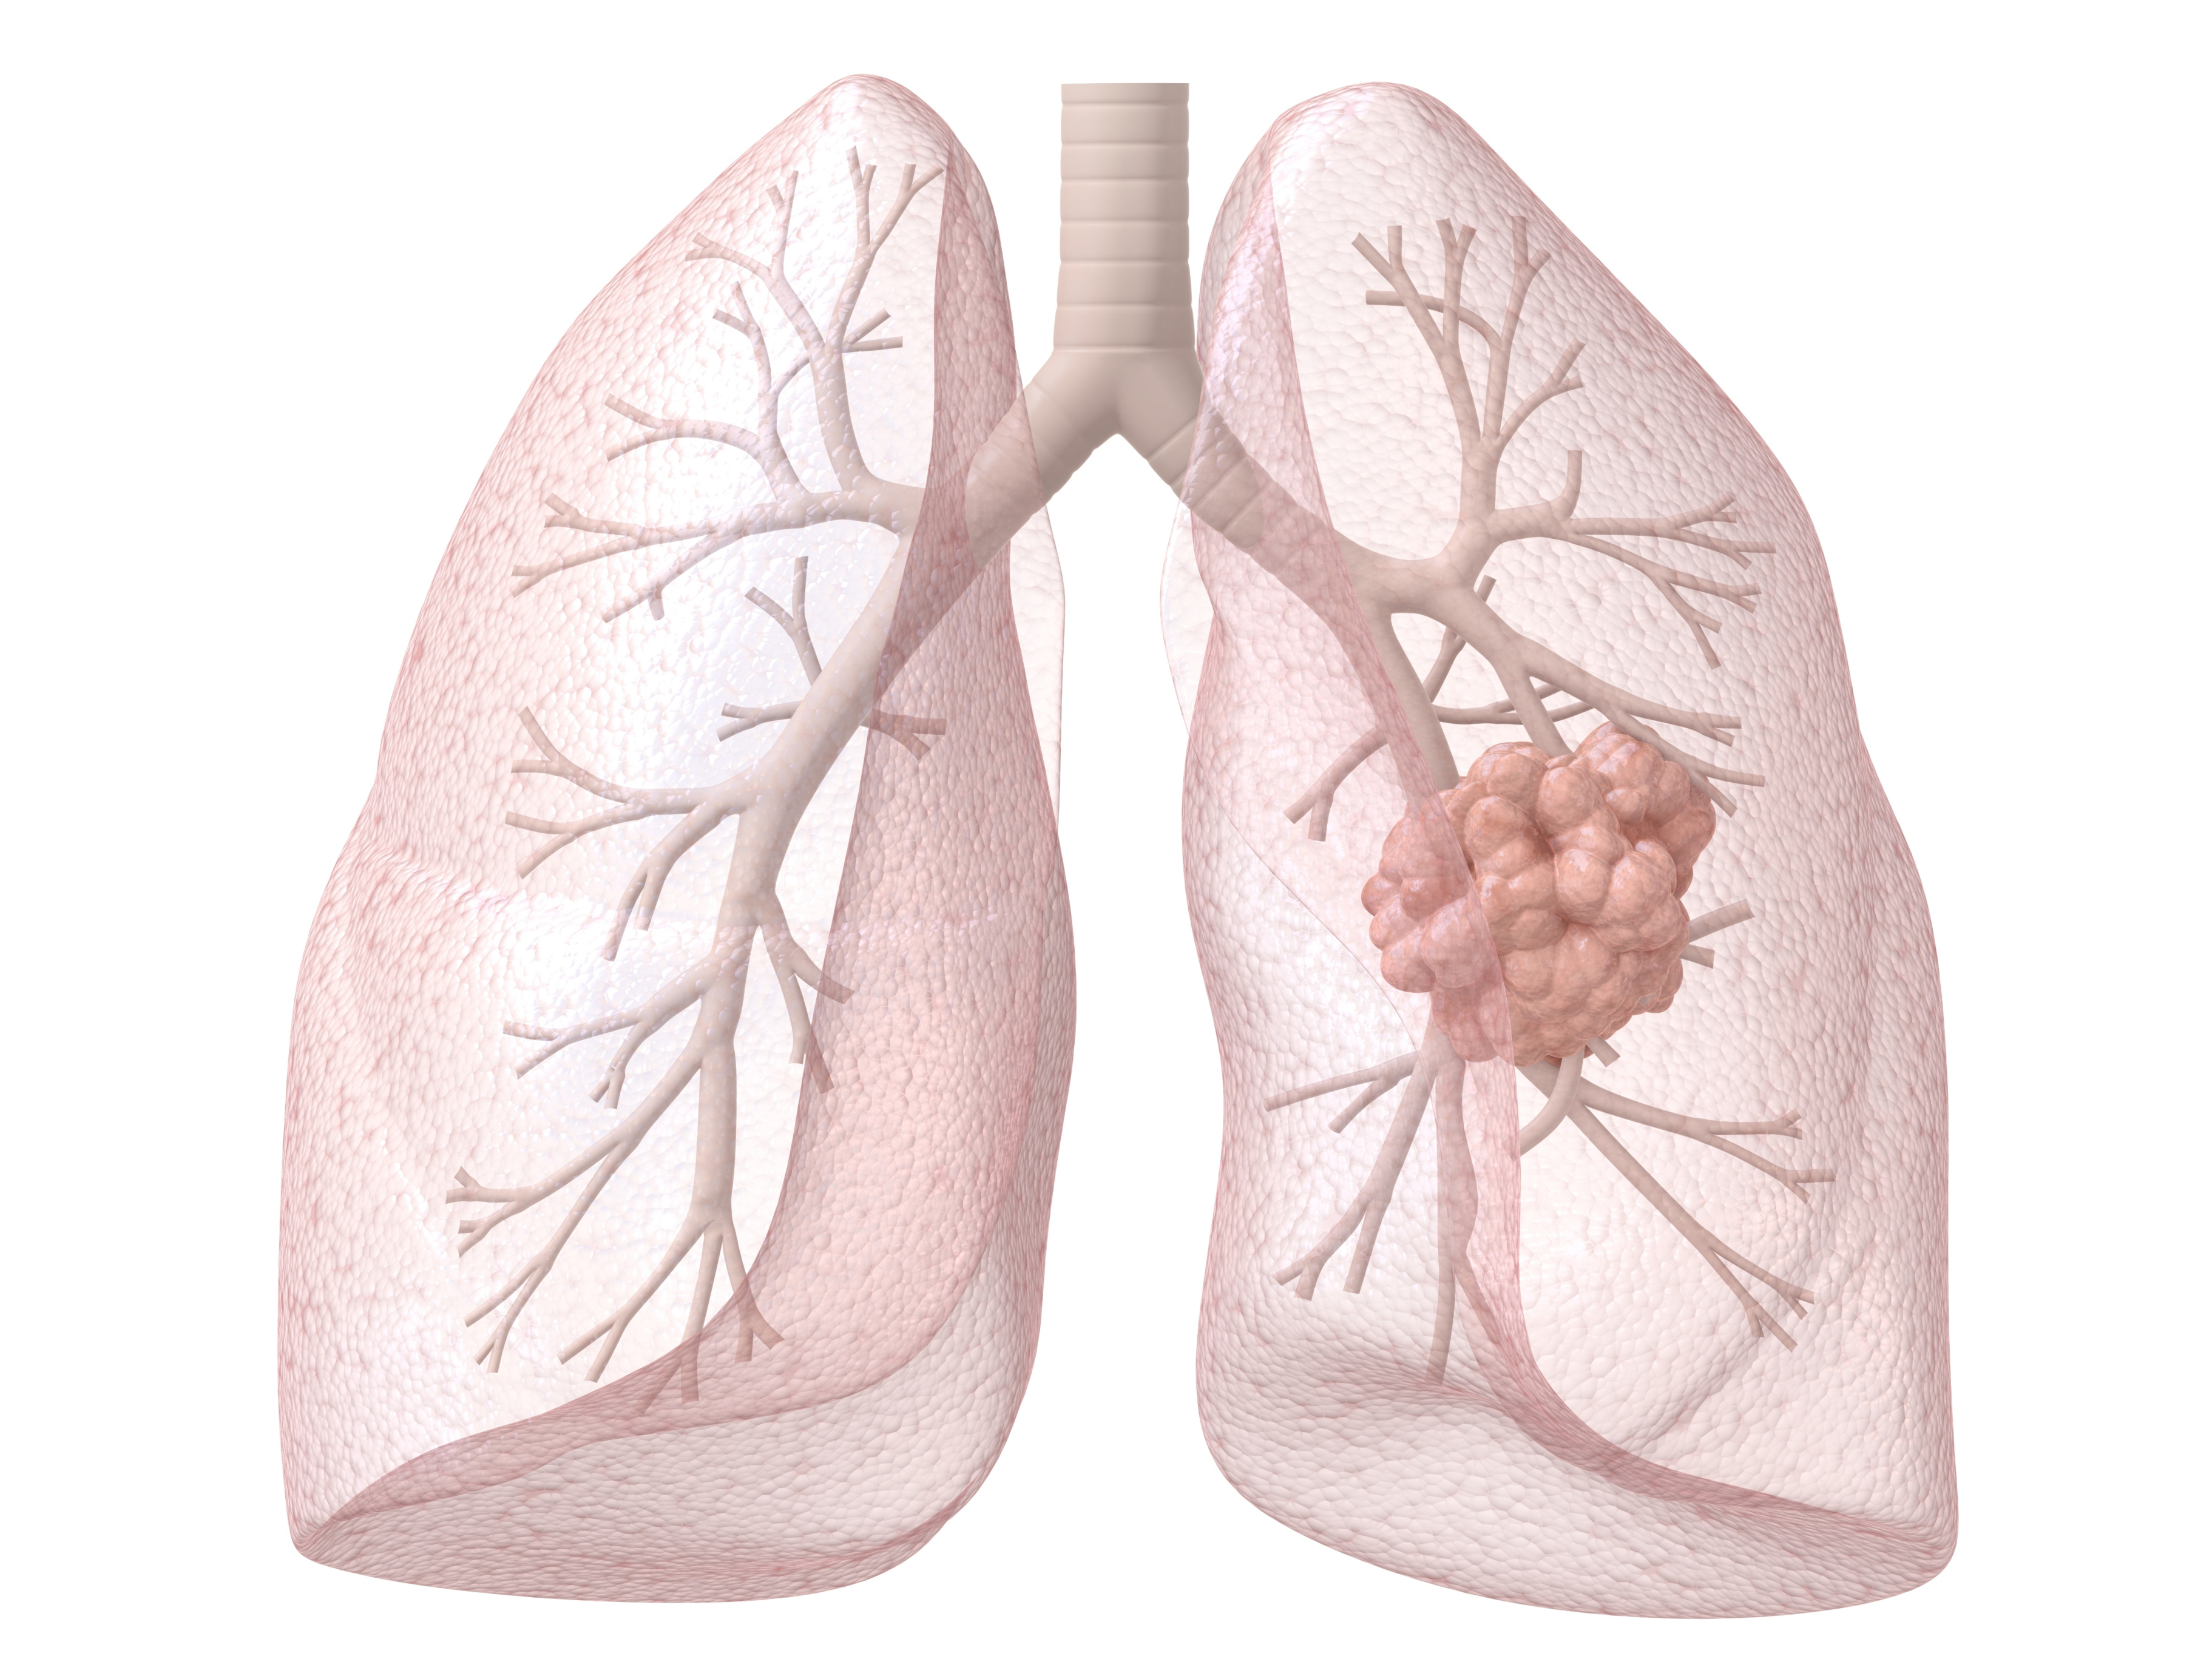 Lung Cancer S Deadly Secret